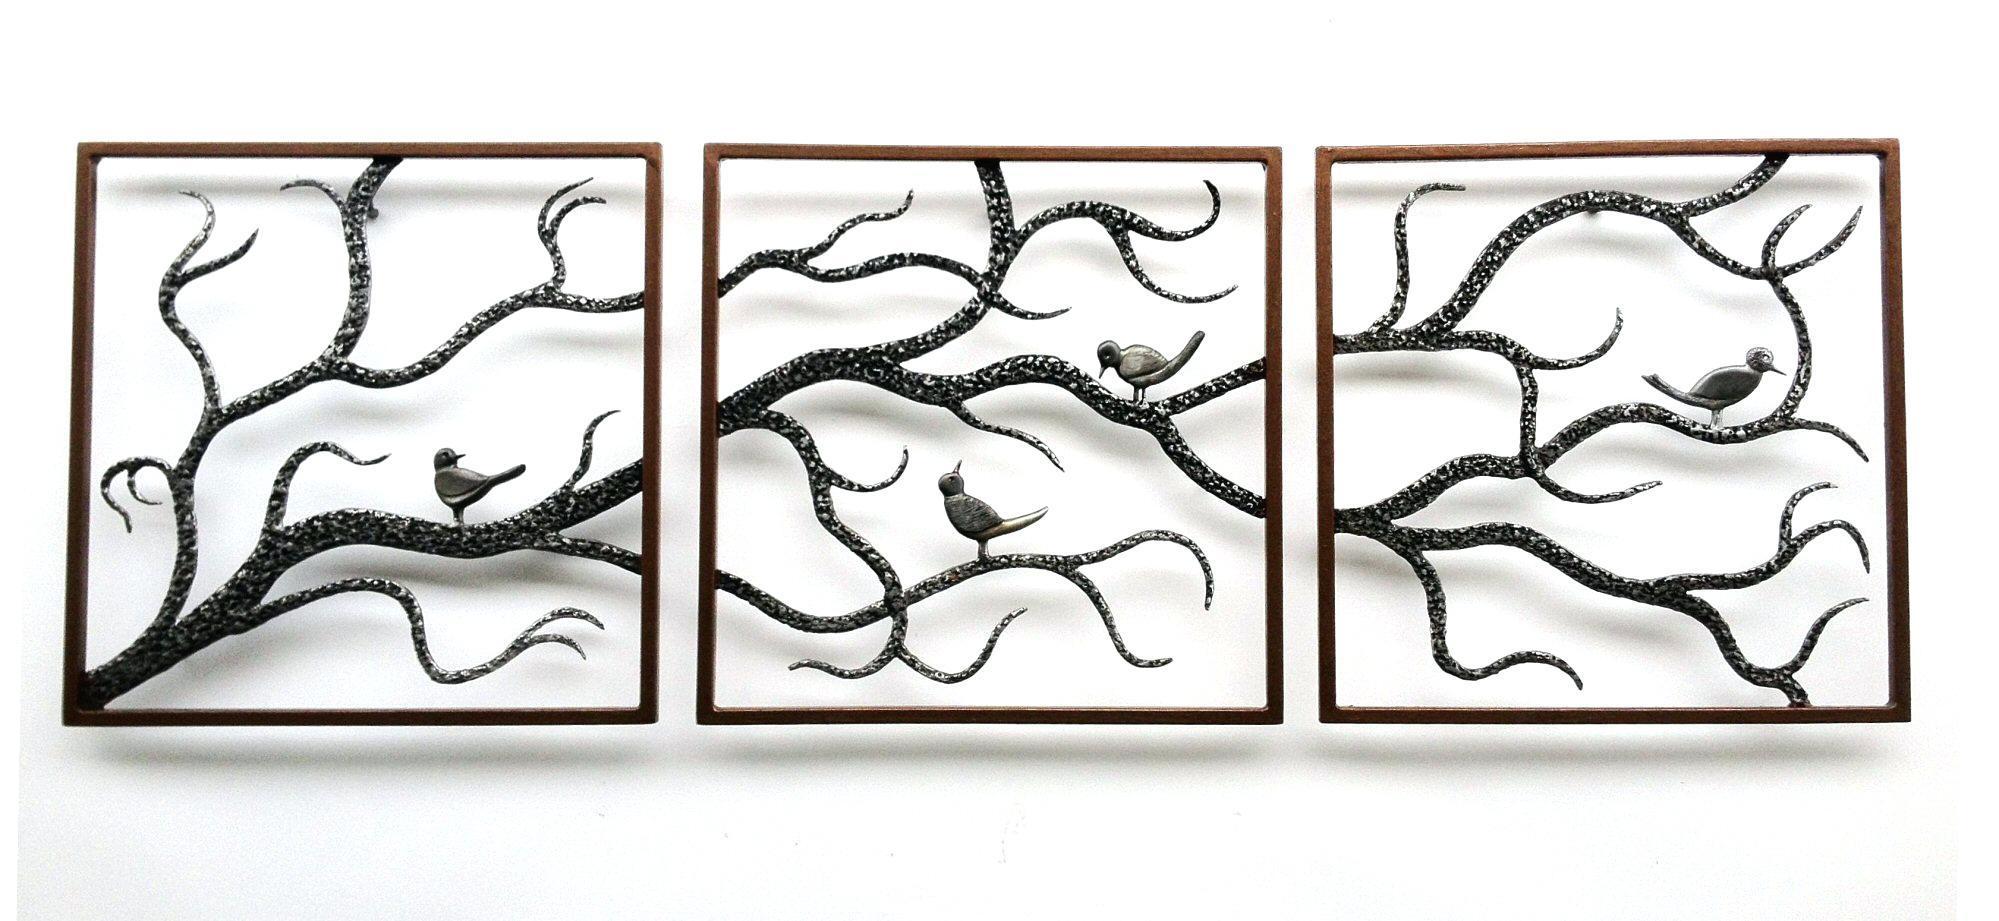 Wall Ideas: Wall Decor Metal. Wall Decor Metal And Wood (Image 20 of 20)